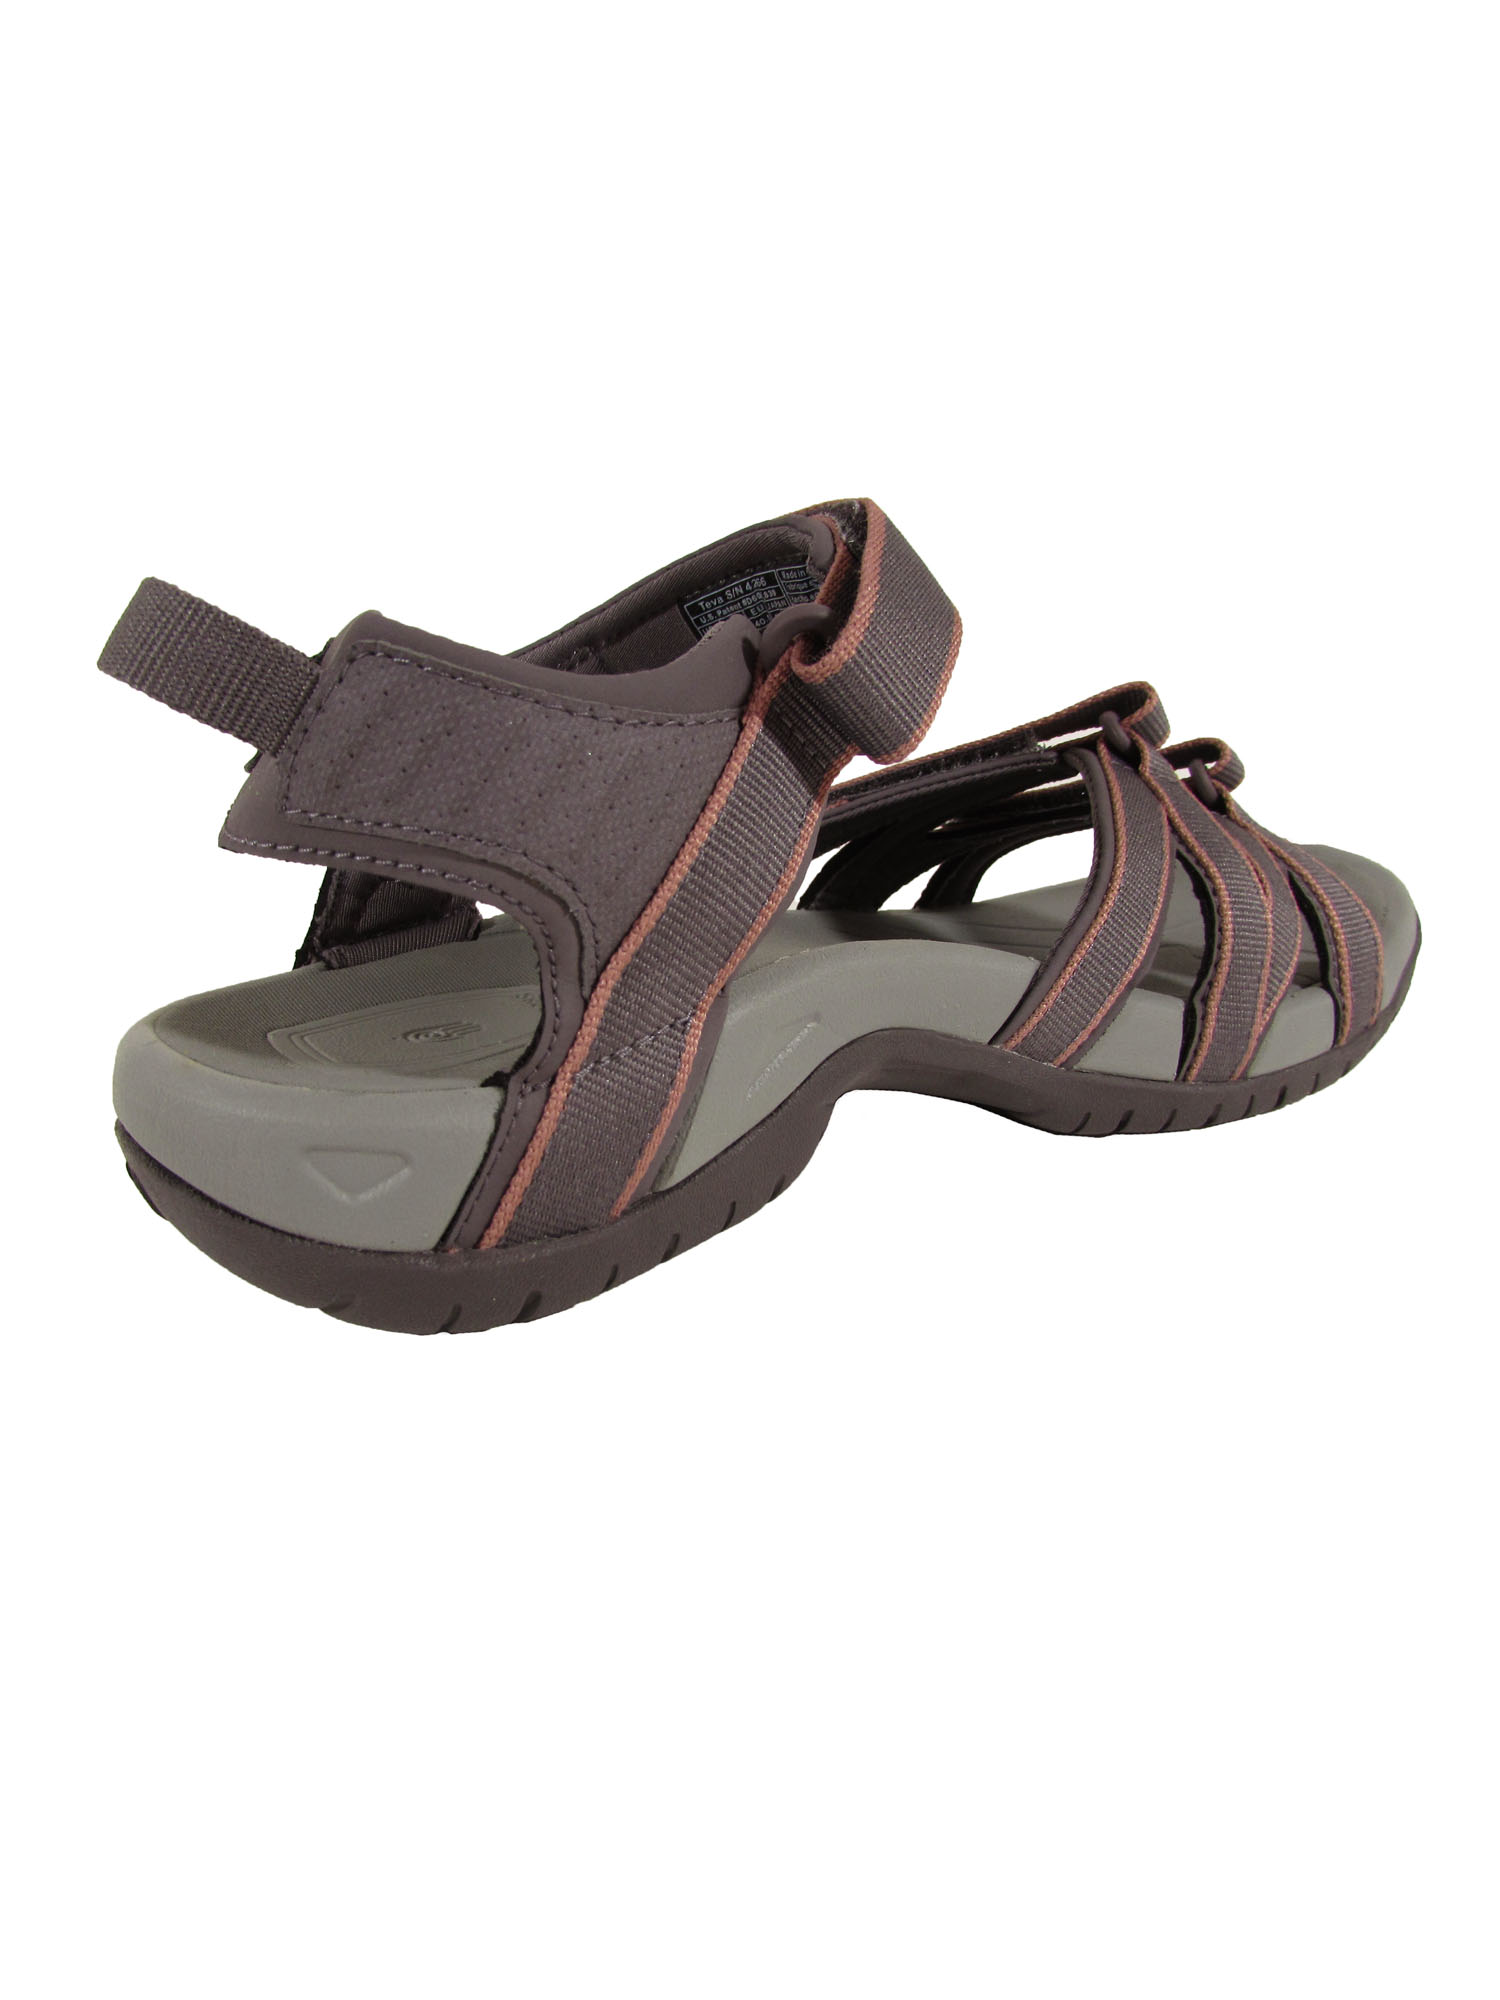 Teva Womens Tirra Multi Purpose Athletic Sandal Shoes Ebay